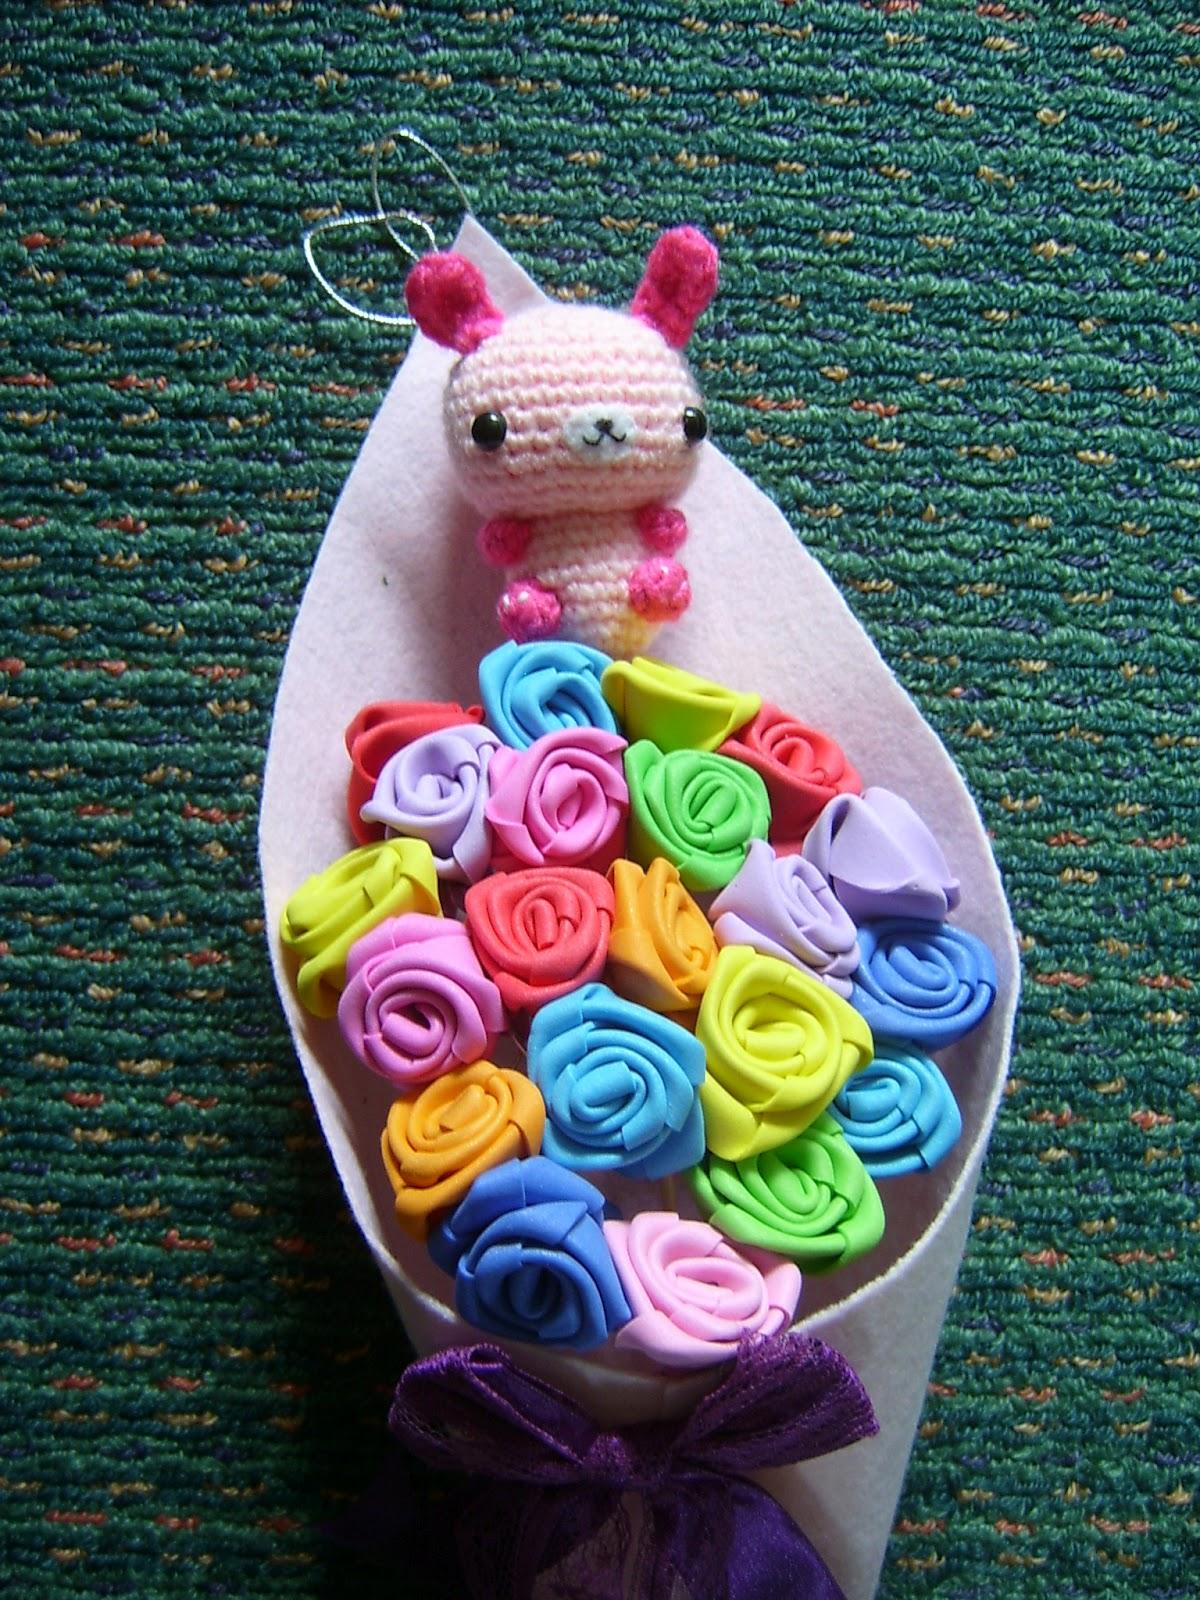 Jewellia Handicrafts Gift Idea For 21st Birthday Present